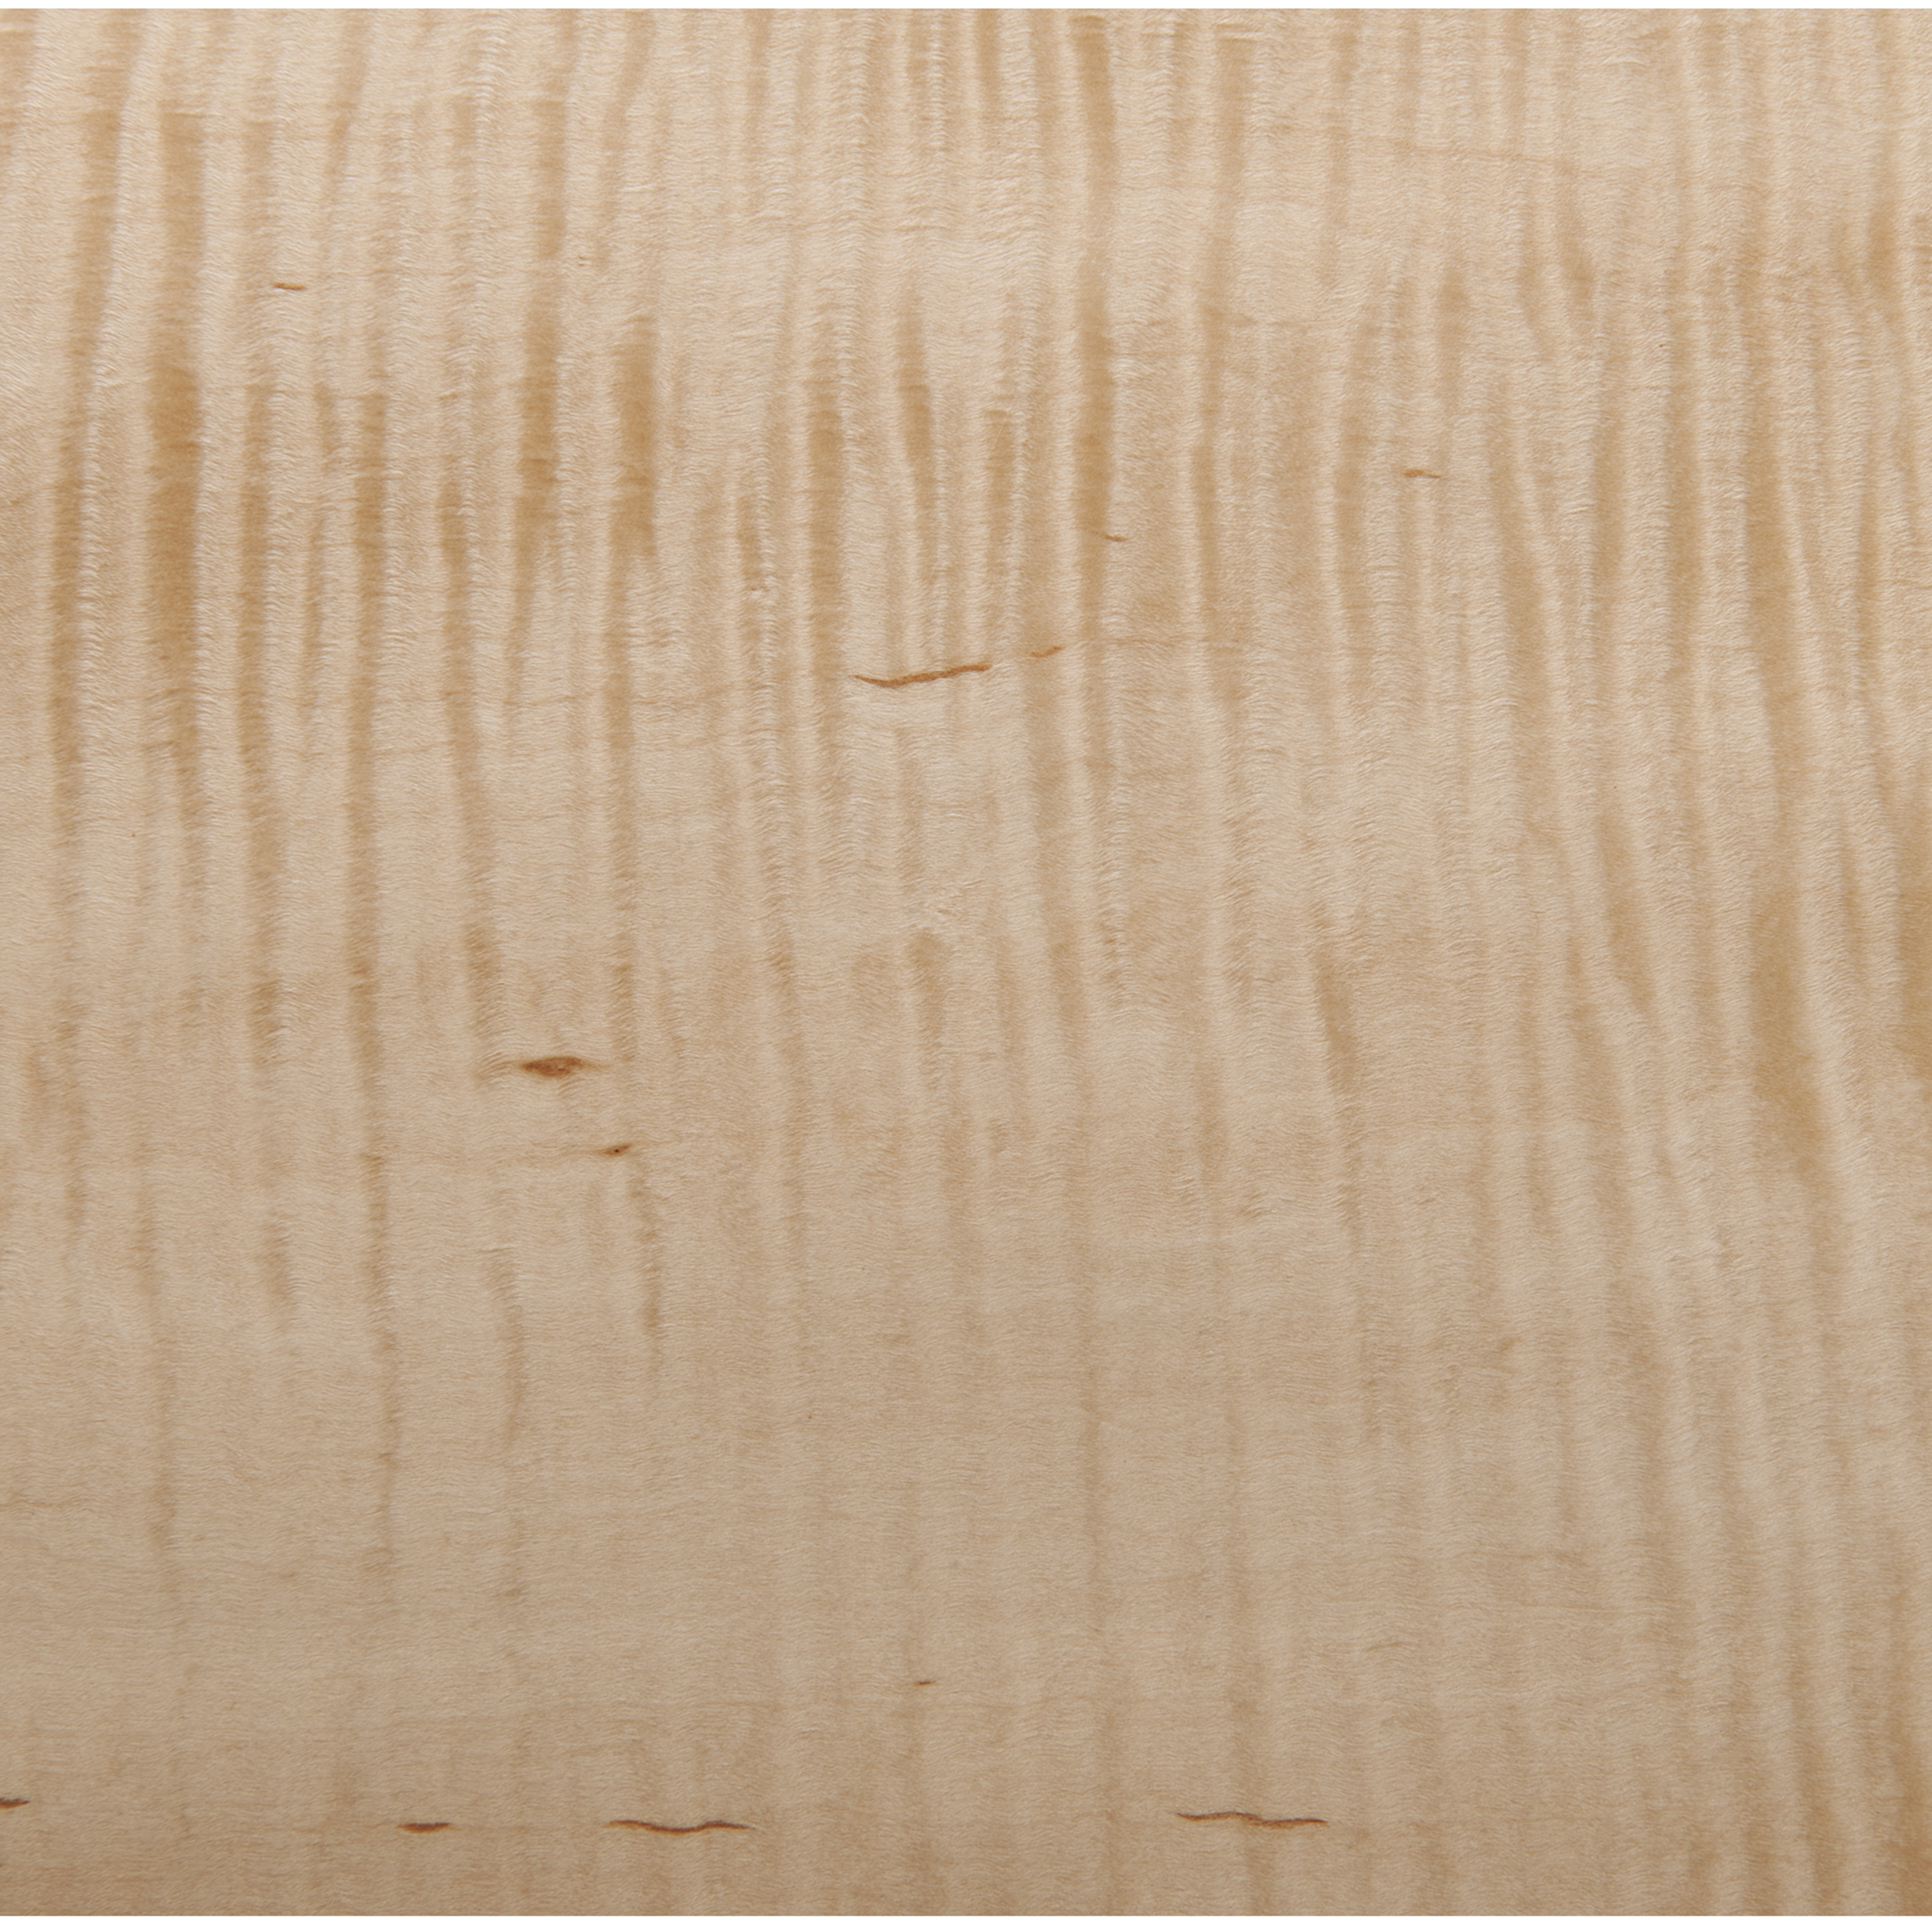 Figured Maple, Heavy Curl 4'X8' Veneer Sheet, 10MIL Paper Backed